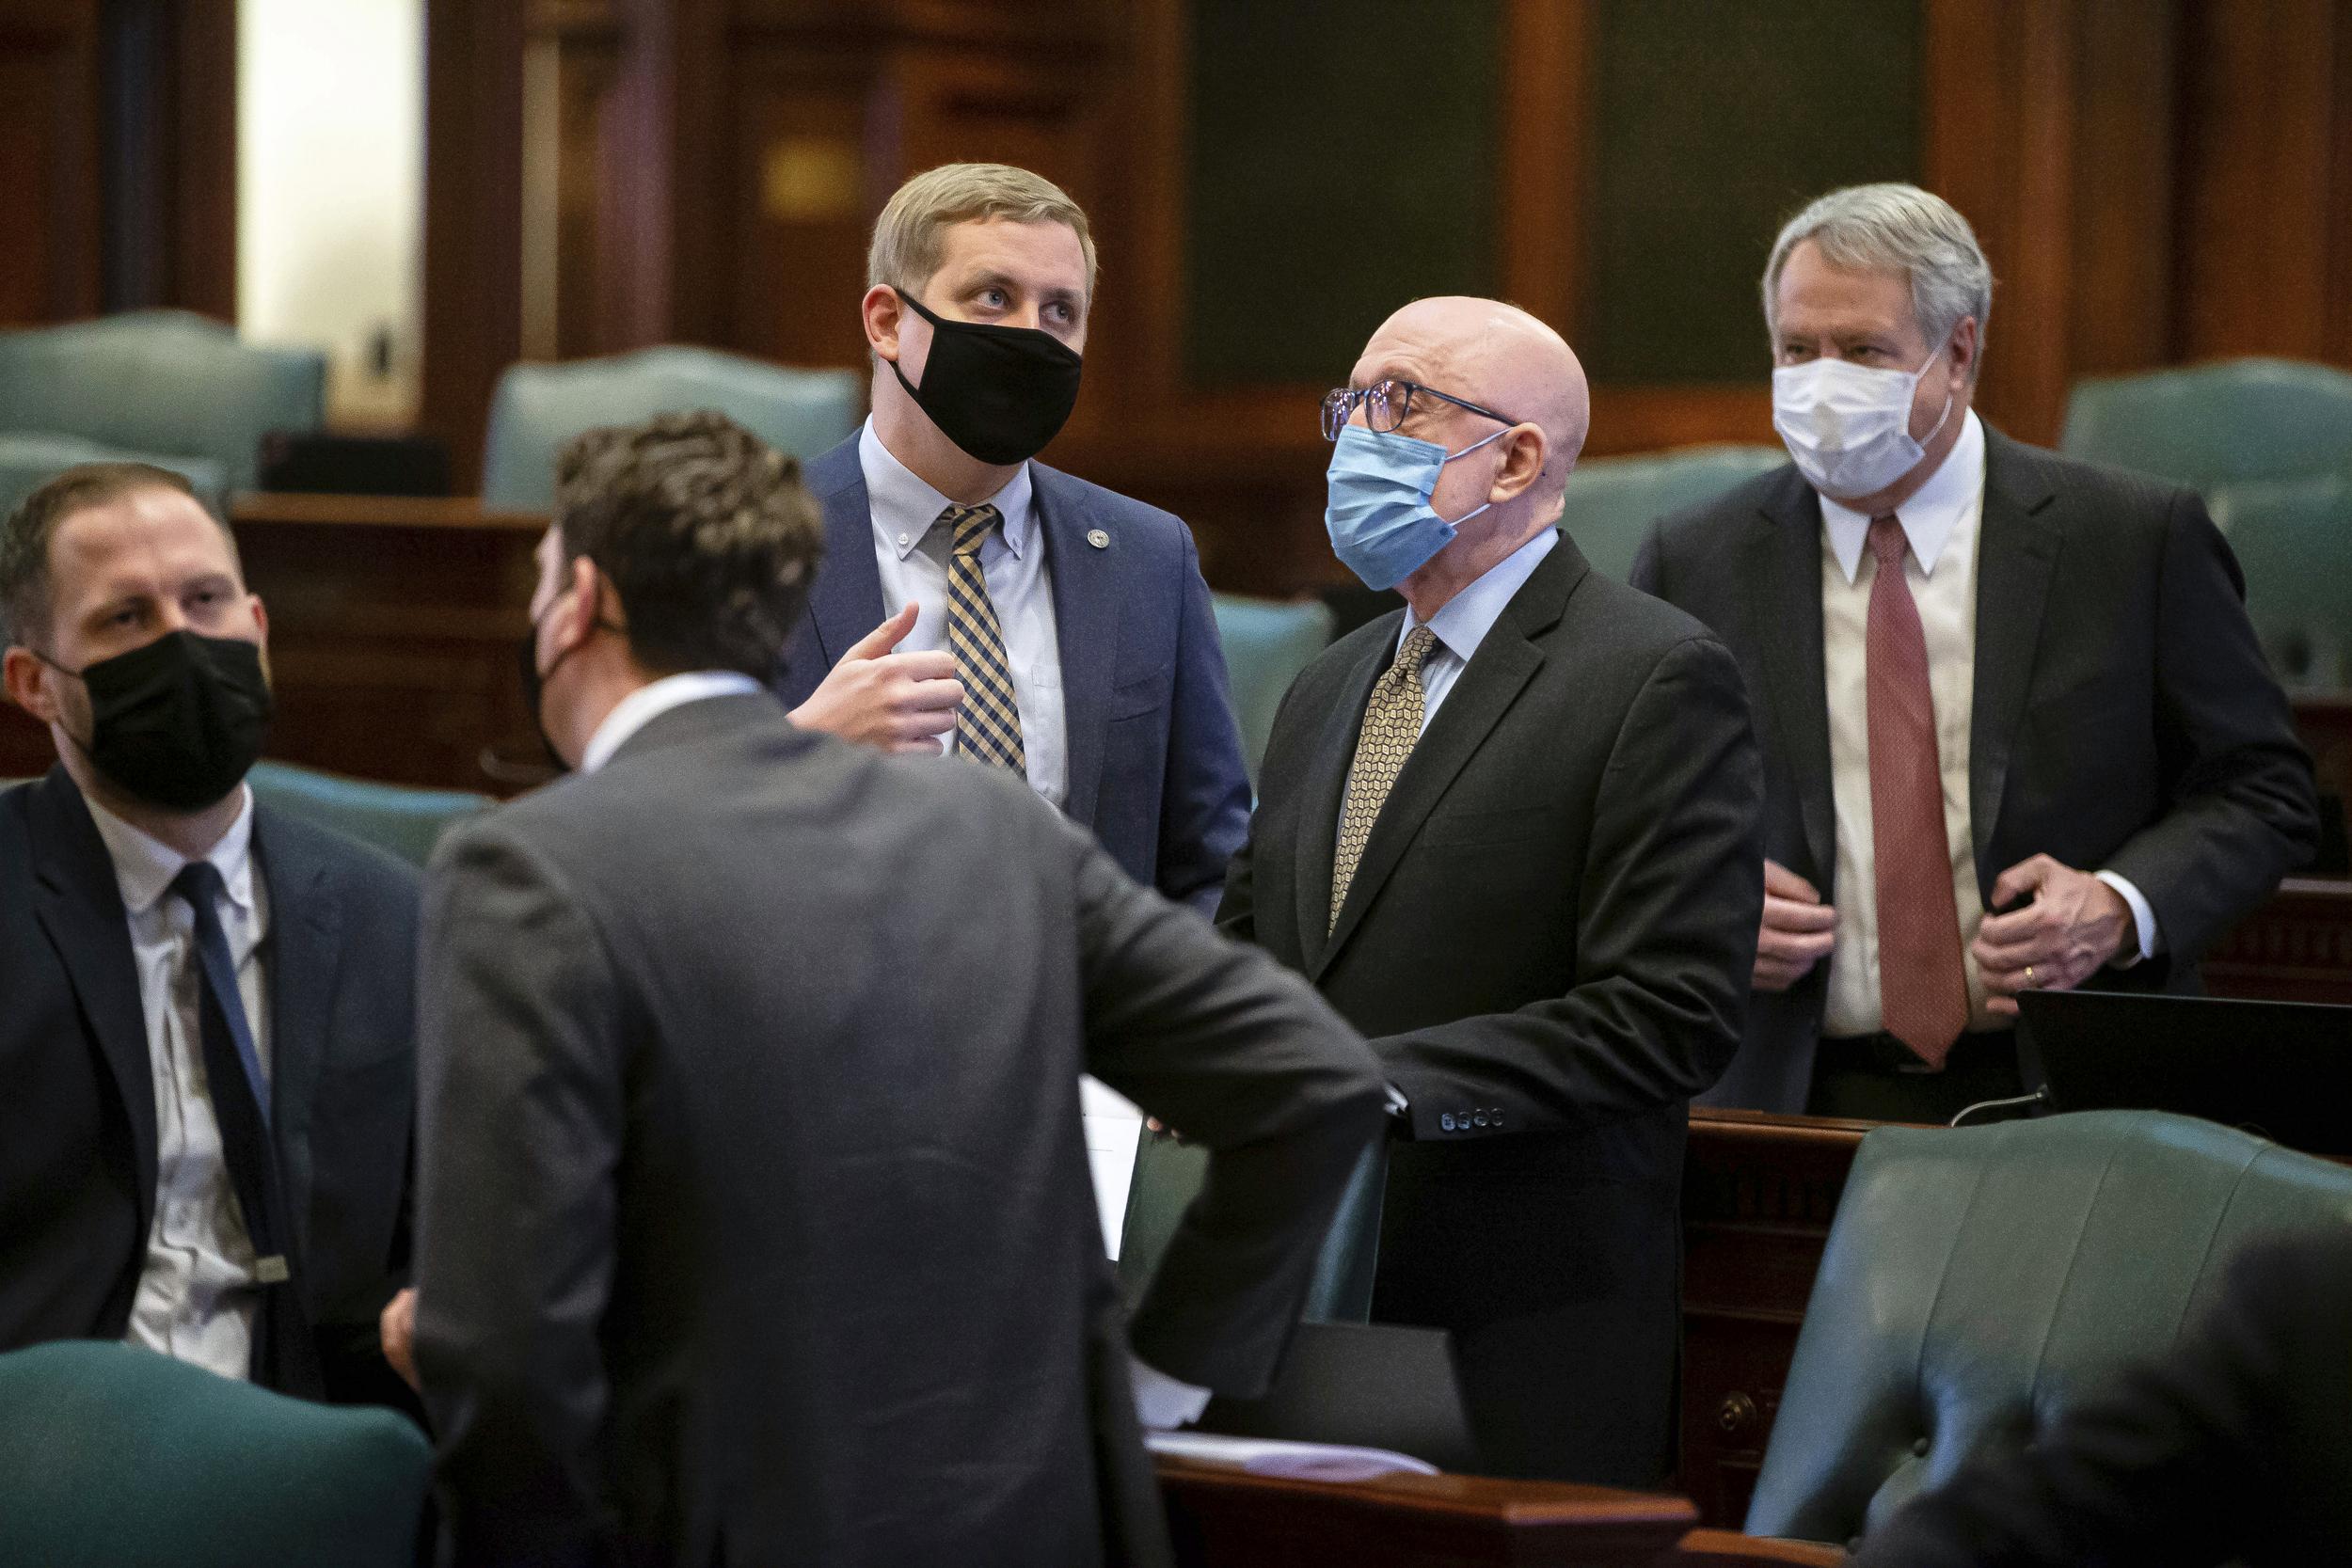 Illinois Democrats set to OK new legislative maps over criticism